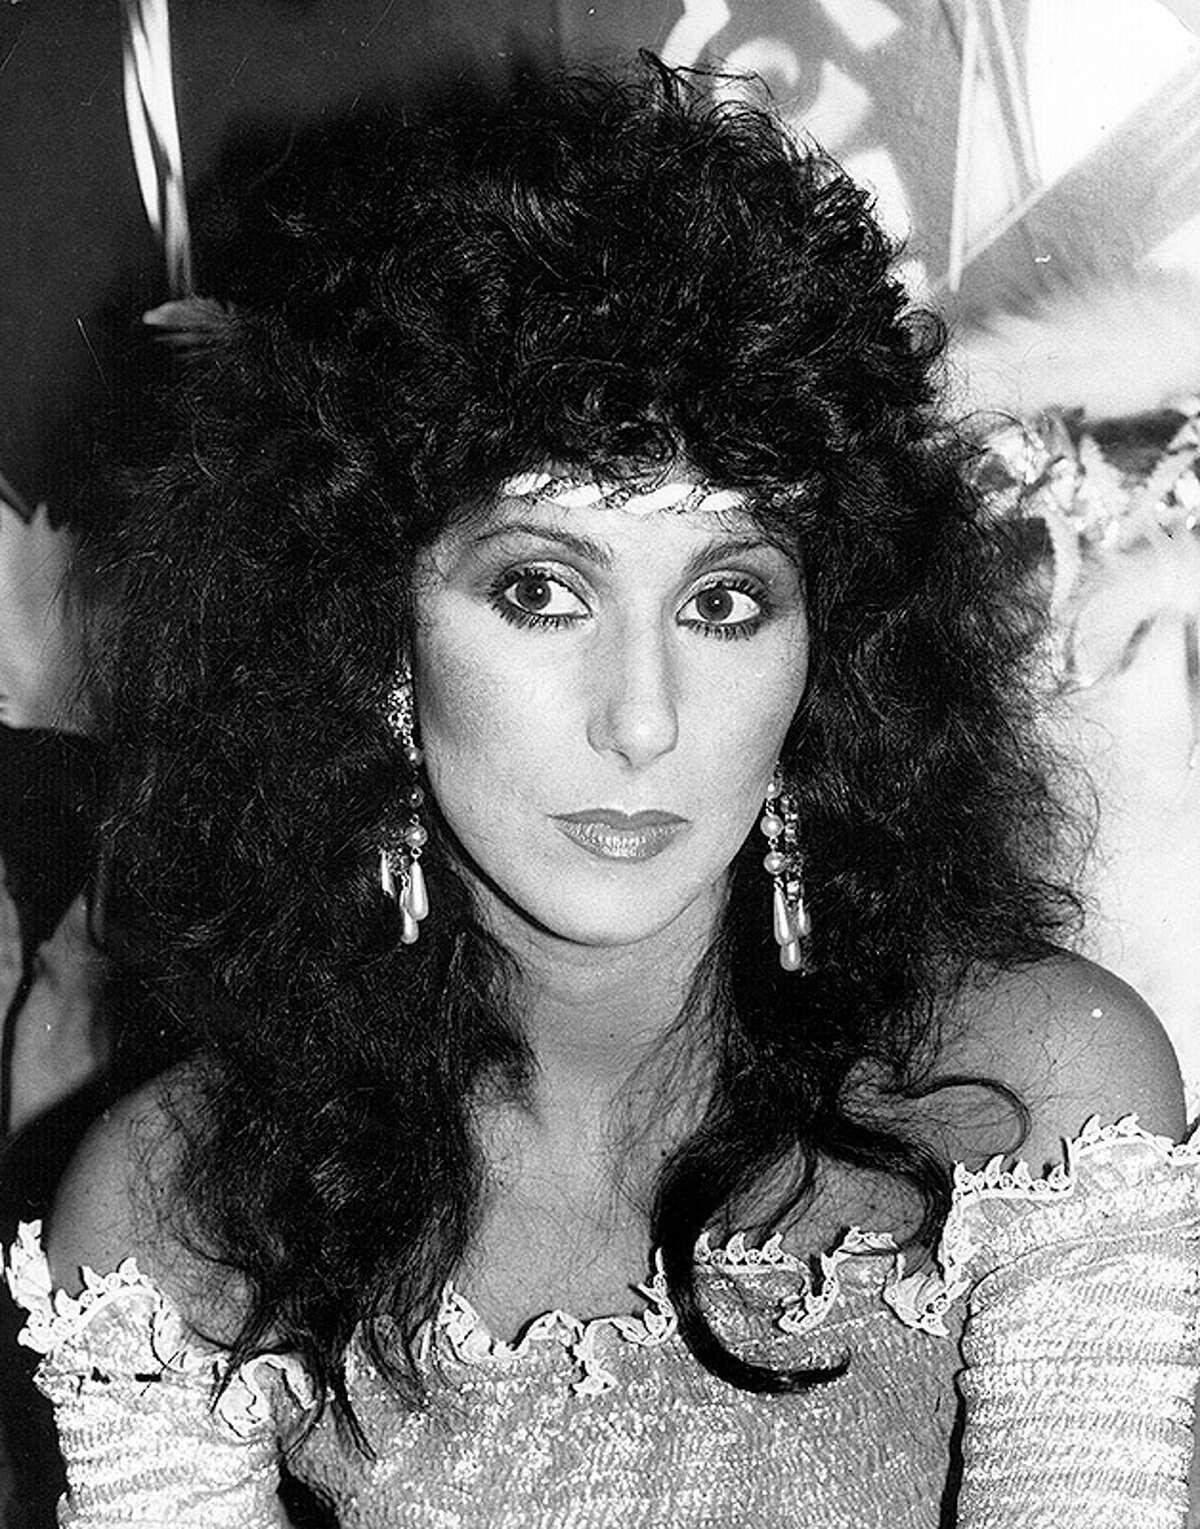 1981: American singer and actress Cher (Cherilyn Sakarsian La Pier).